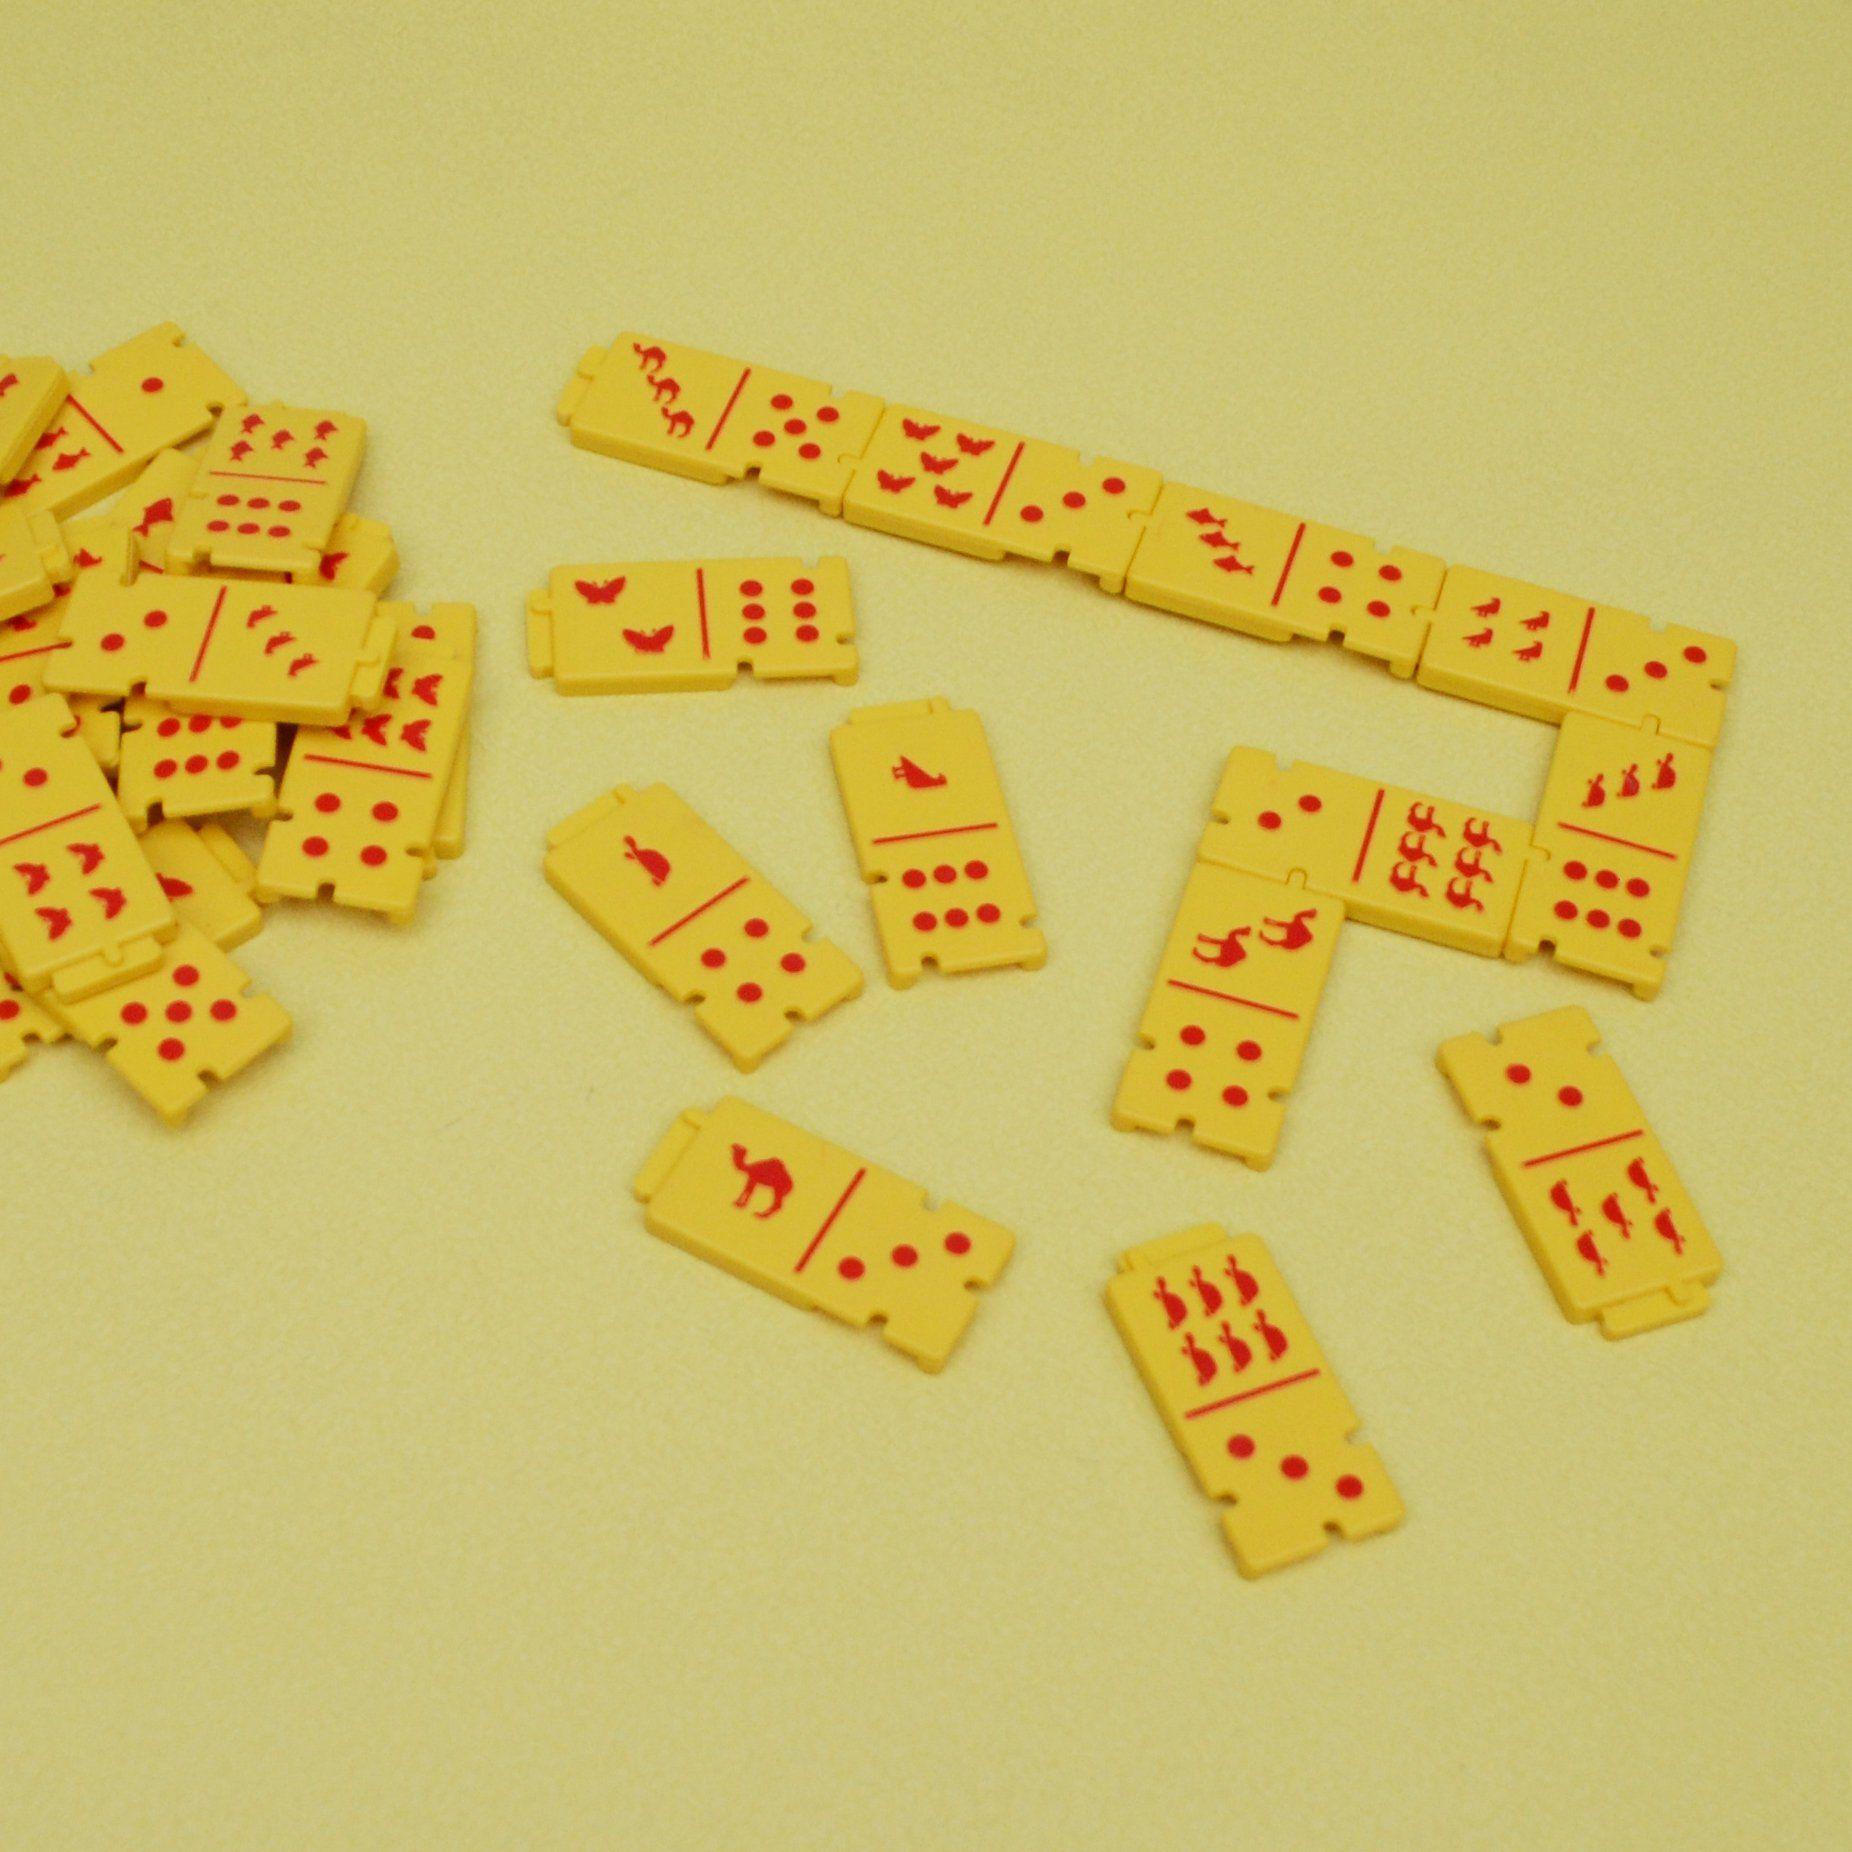 Vintage domino table Board game Dominoes